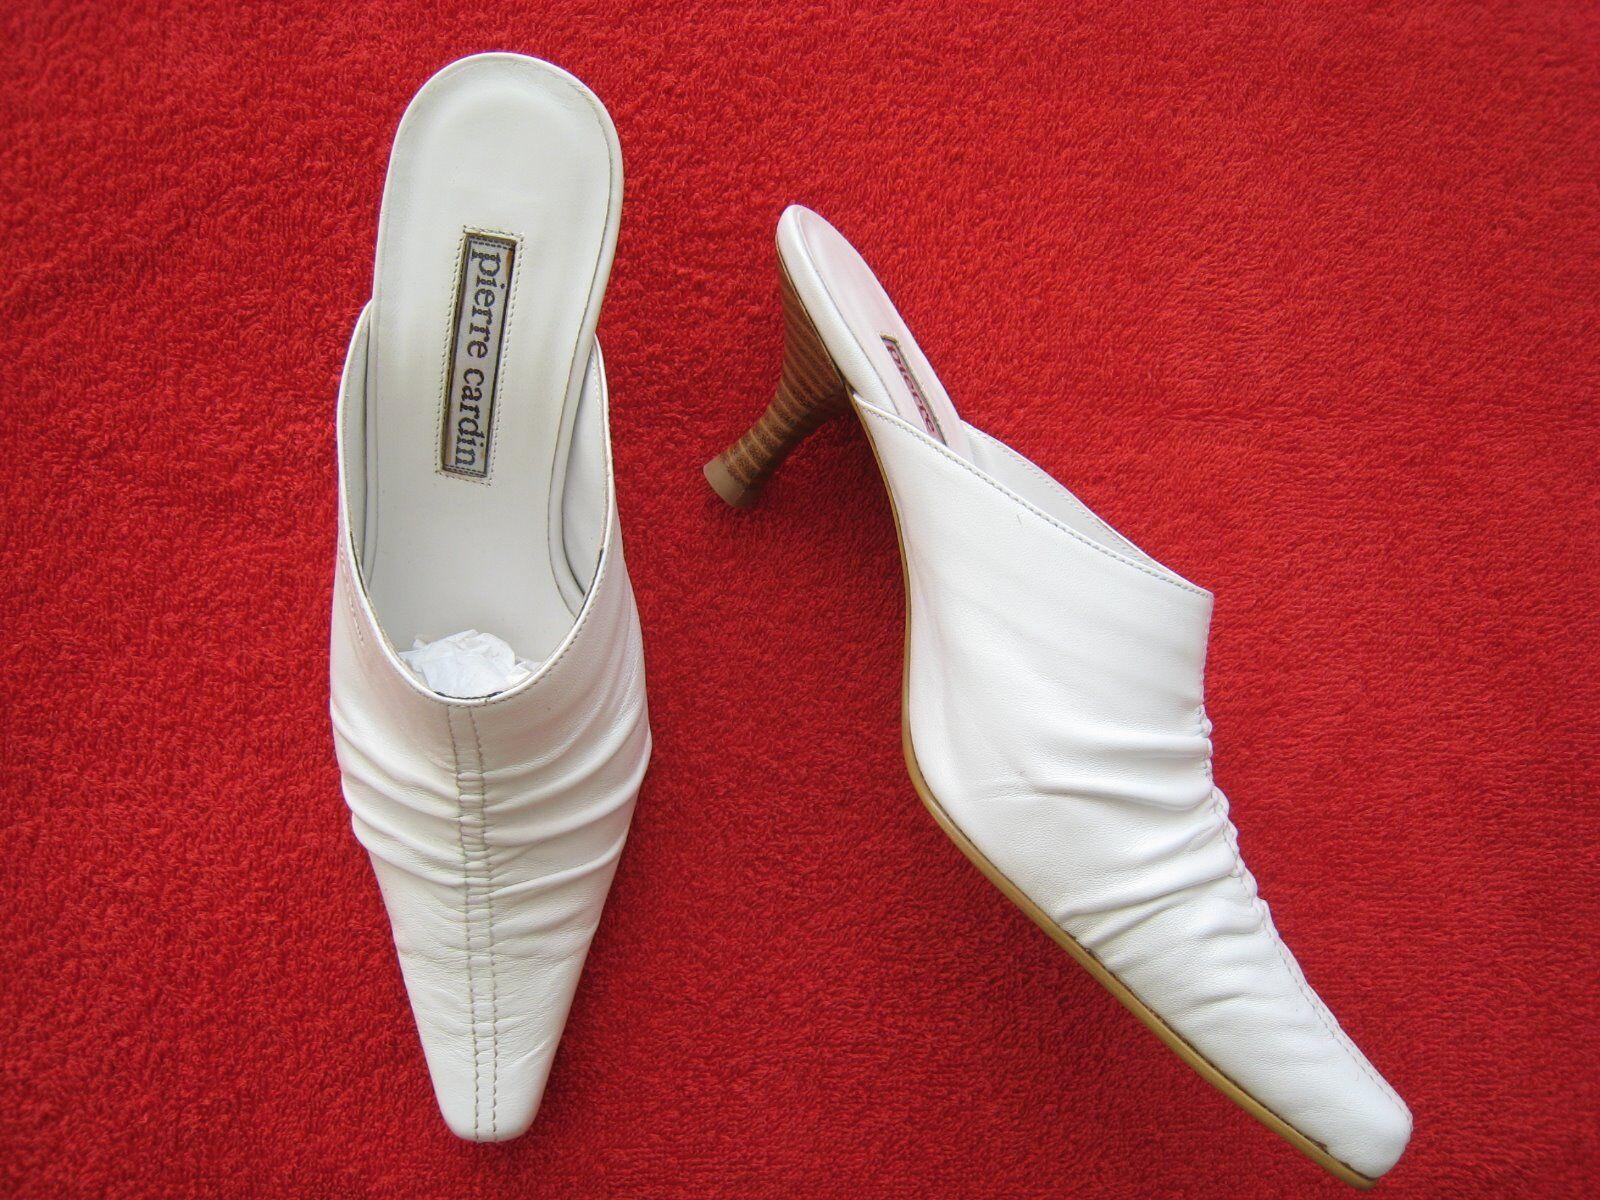 PIERRE CARDIN Damen Schuhe Pantoletten Echt Leder, Gr. 36, Weiß, NEU mit Karton